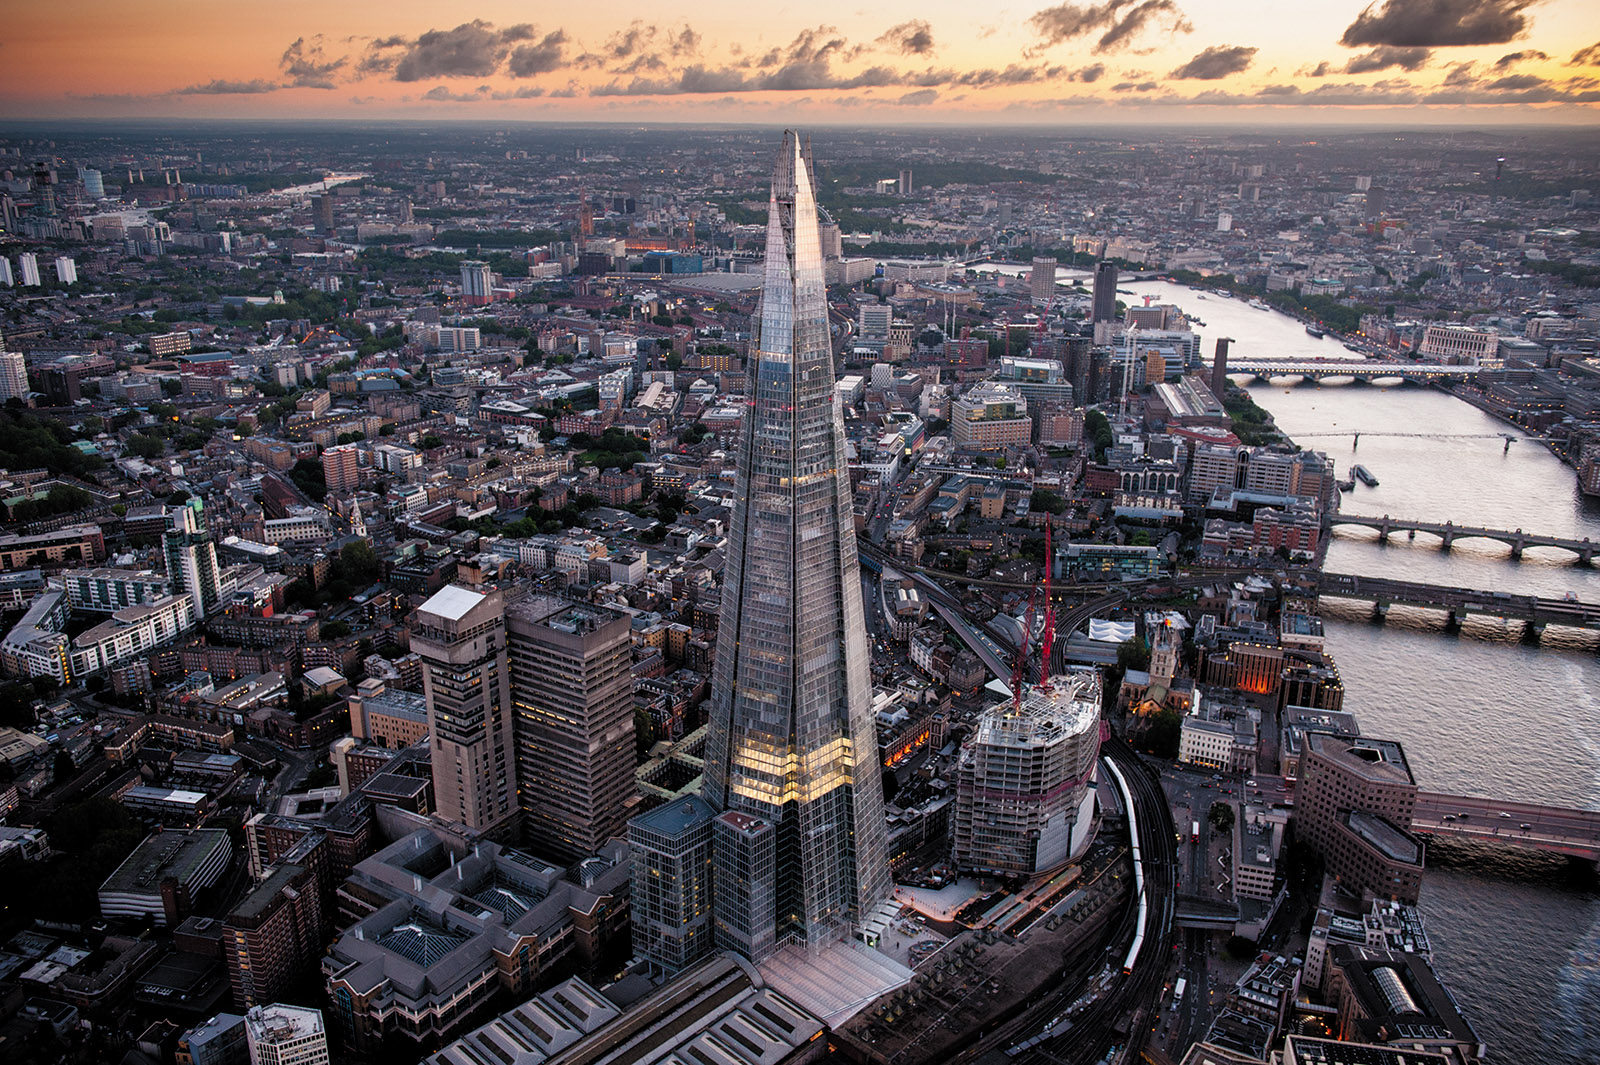 The Shard, London's tallest skyscraper, June 2012